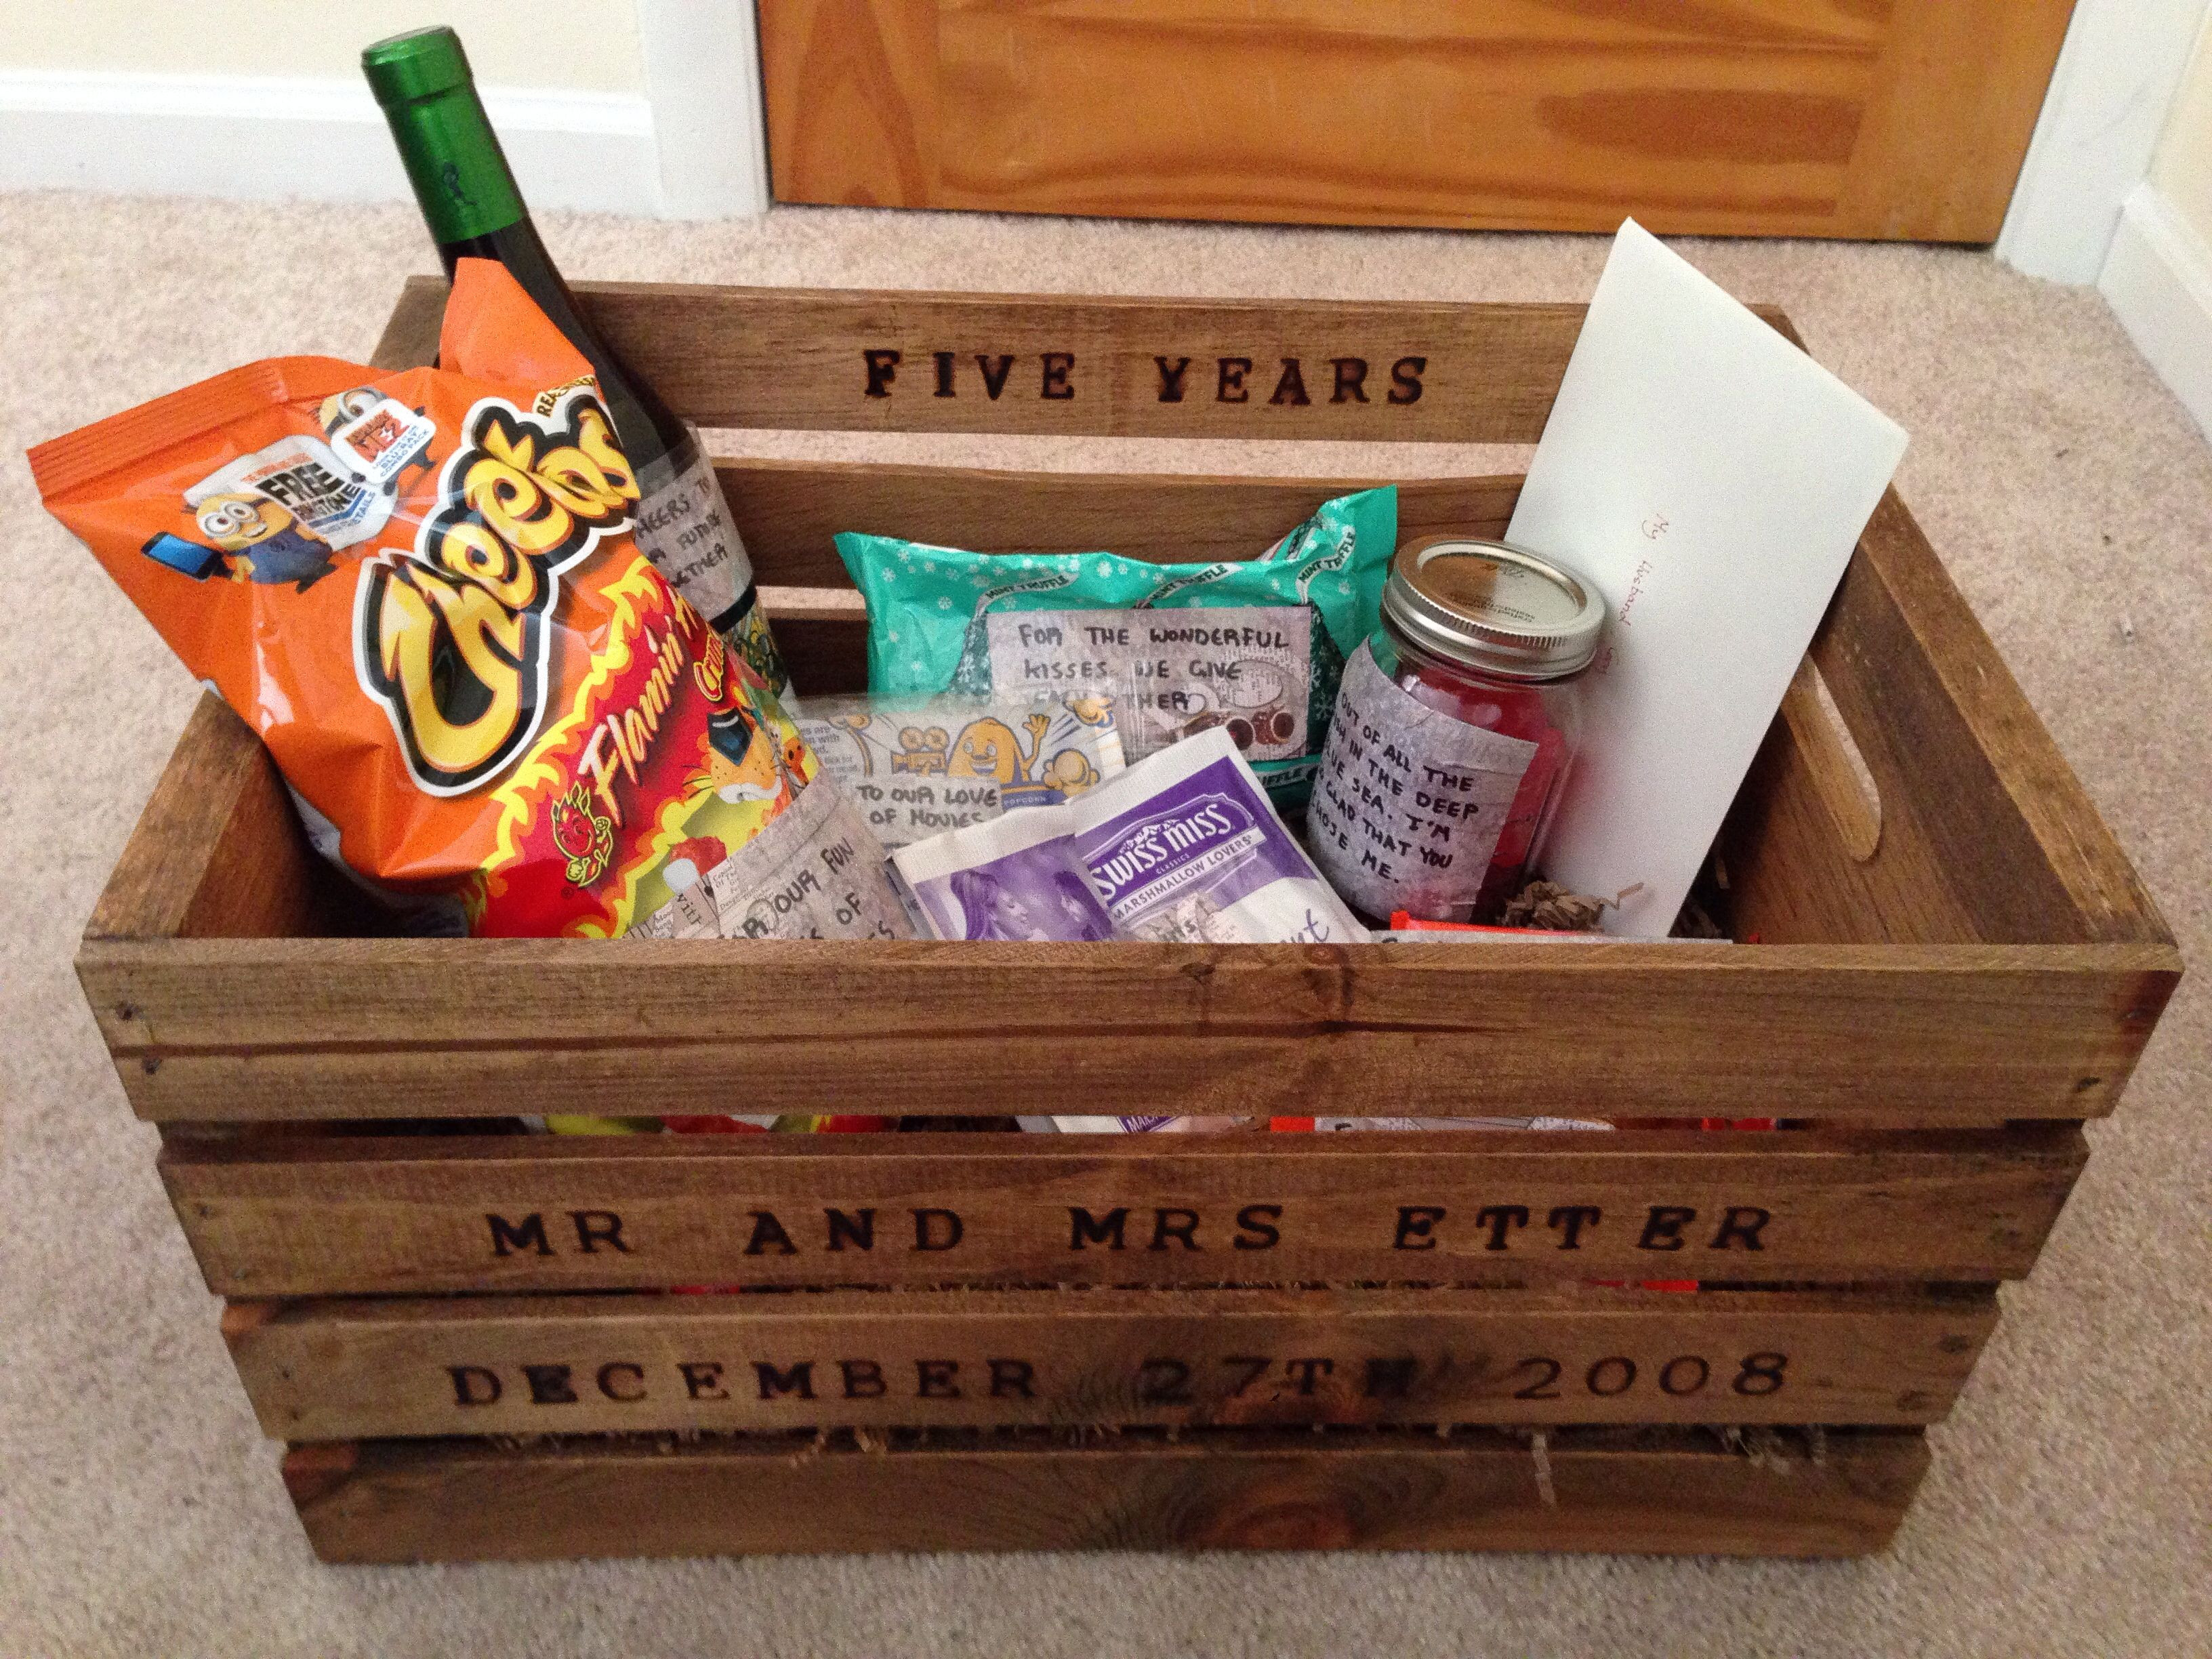 Best ideas about 4 Year Wedding Anniversary Gift Ideas . Save or Pin Gift For 5 Year Anniversary creative Pinterest Now.